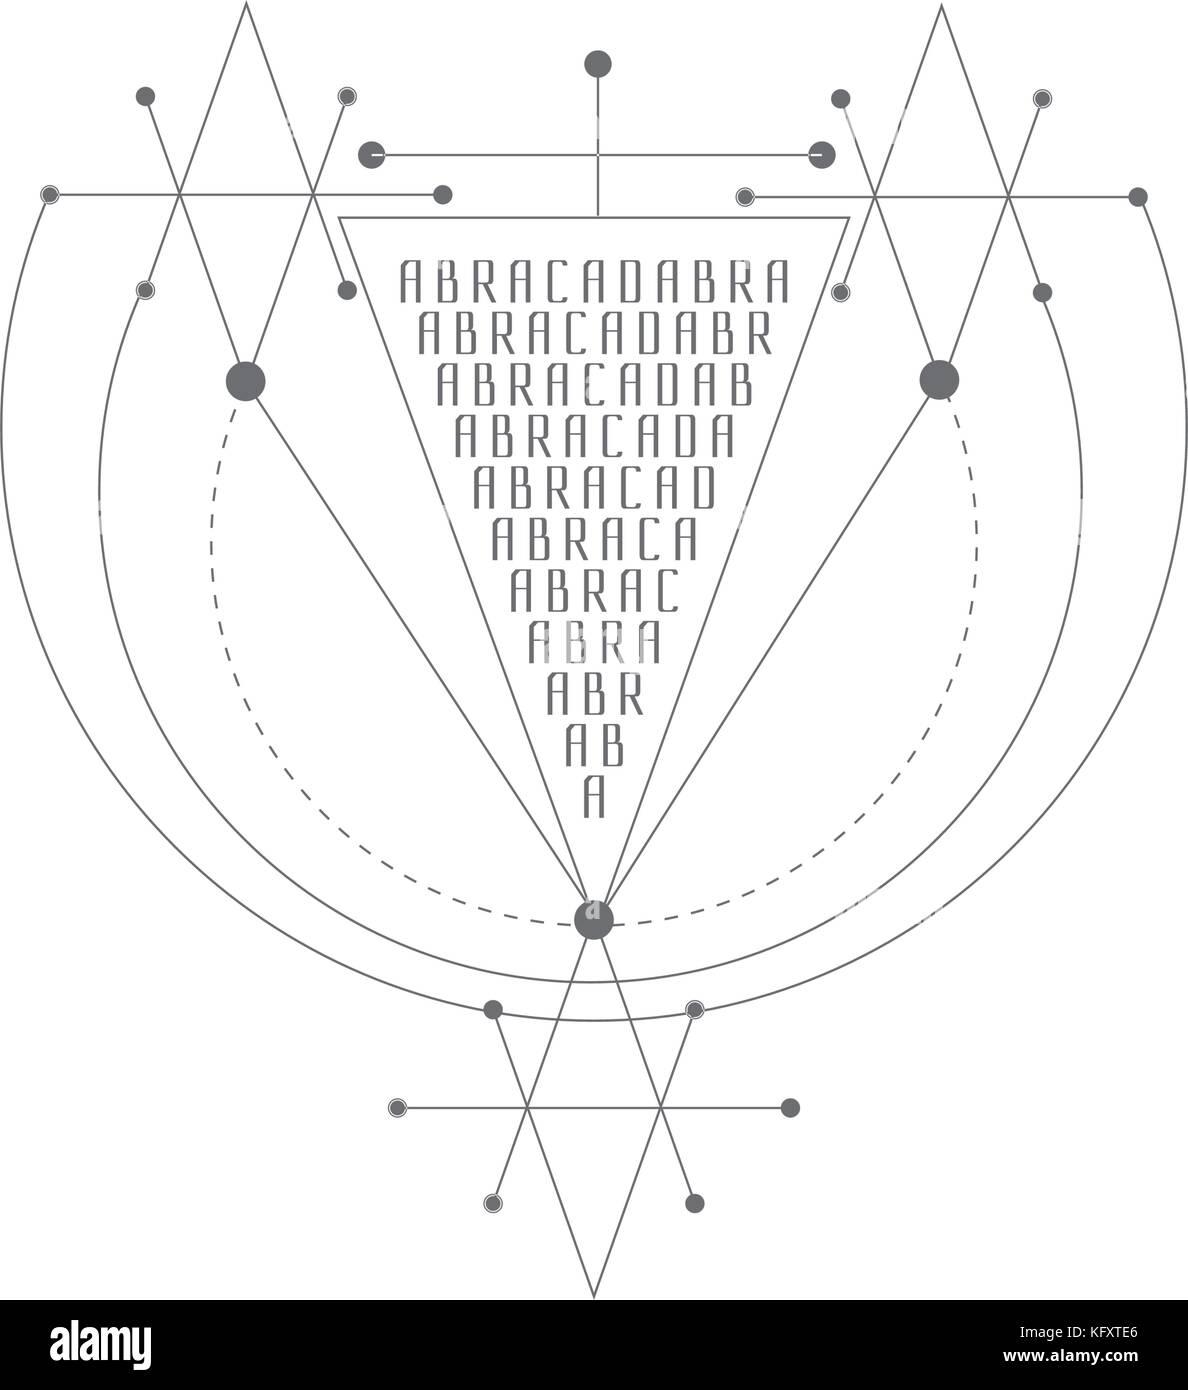 Alchemy symbol stock photos alchemy symbol stock images alamy vector magic alchemy symbol geometric logo for spirituality occultism tattoo art and print biocorpaavc